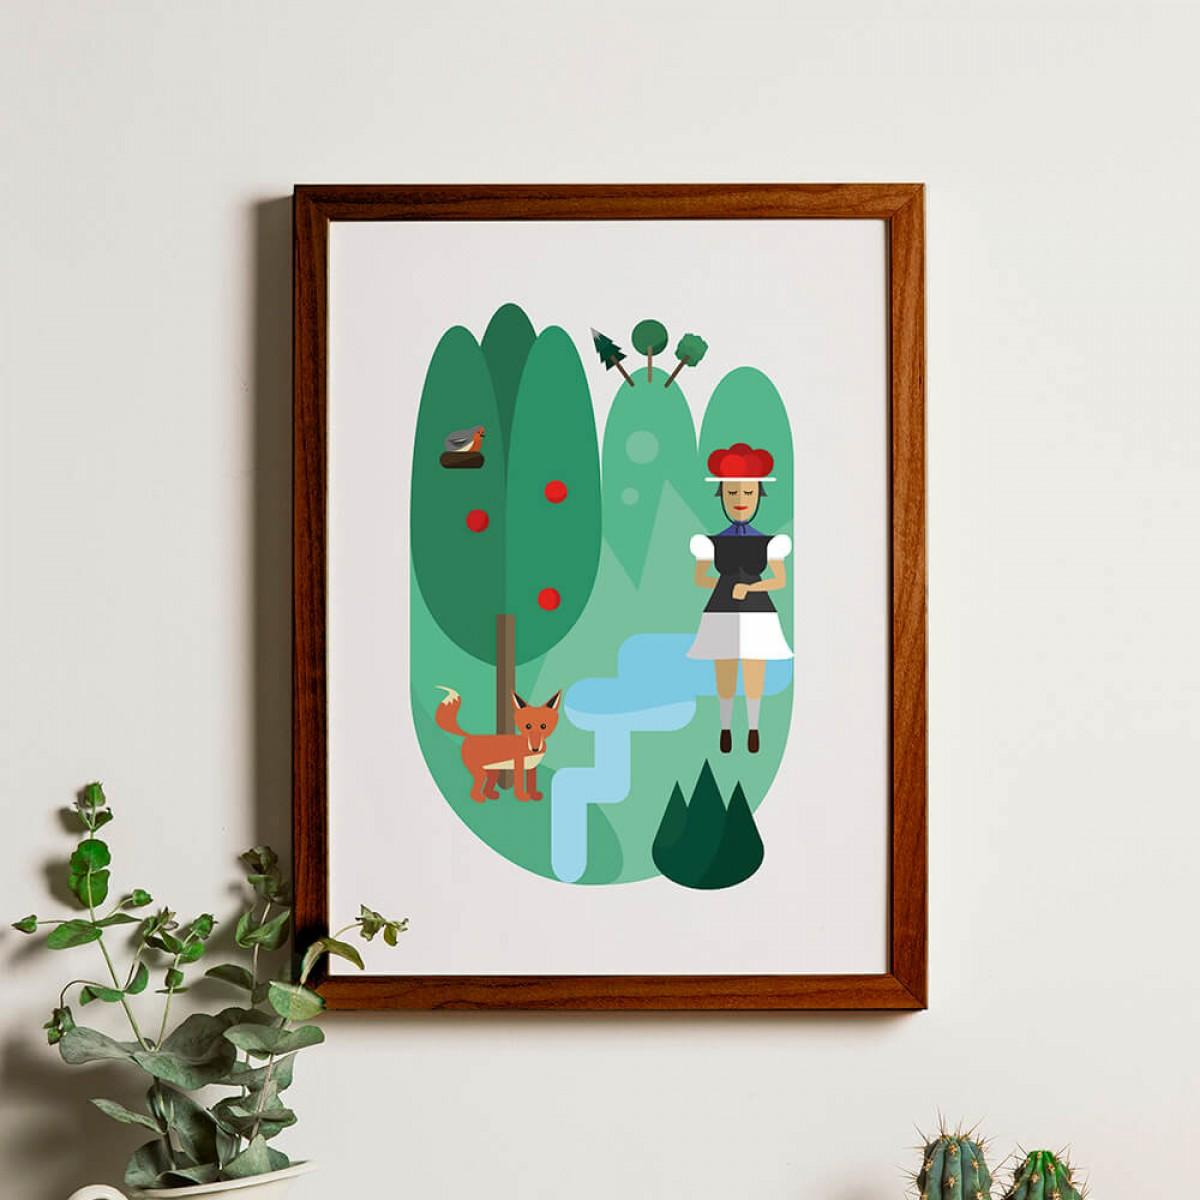 Chiara Tempel – Oh, du schöner Schwarzwald – Poster B2 (500x700mm)